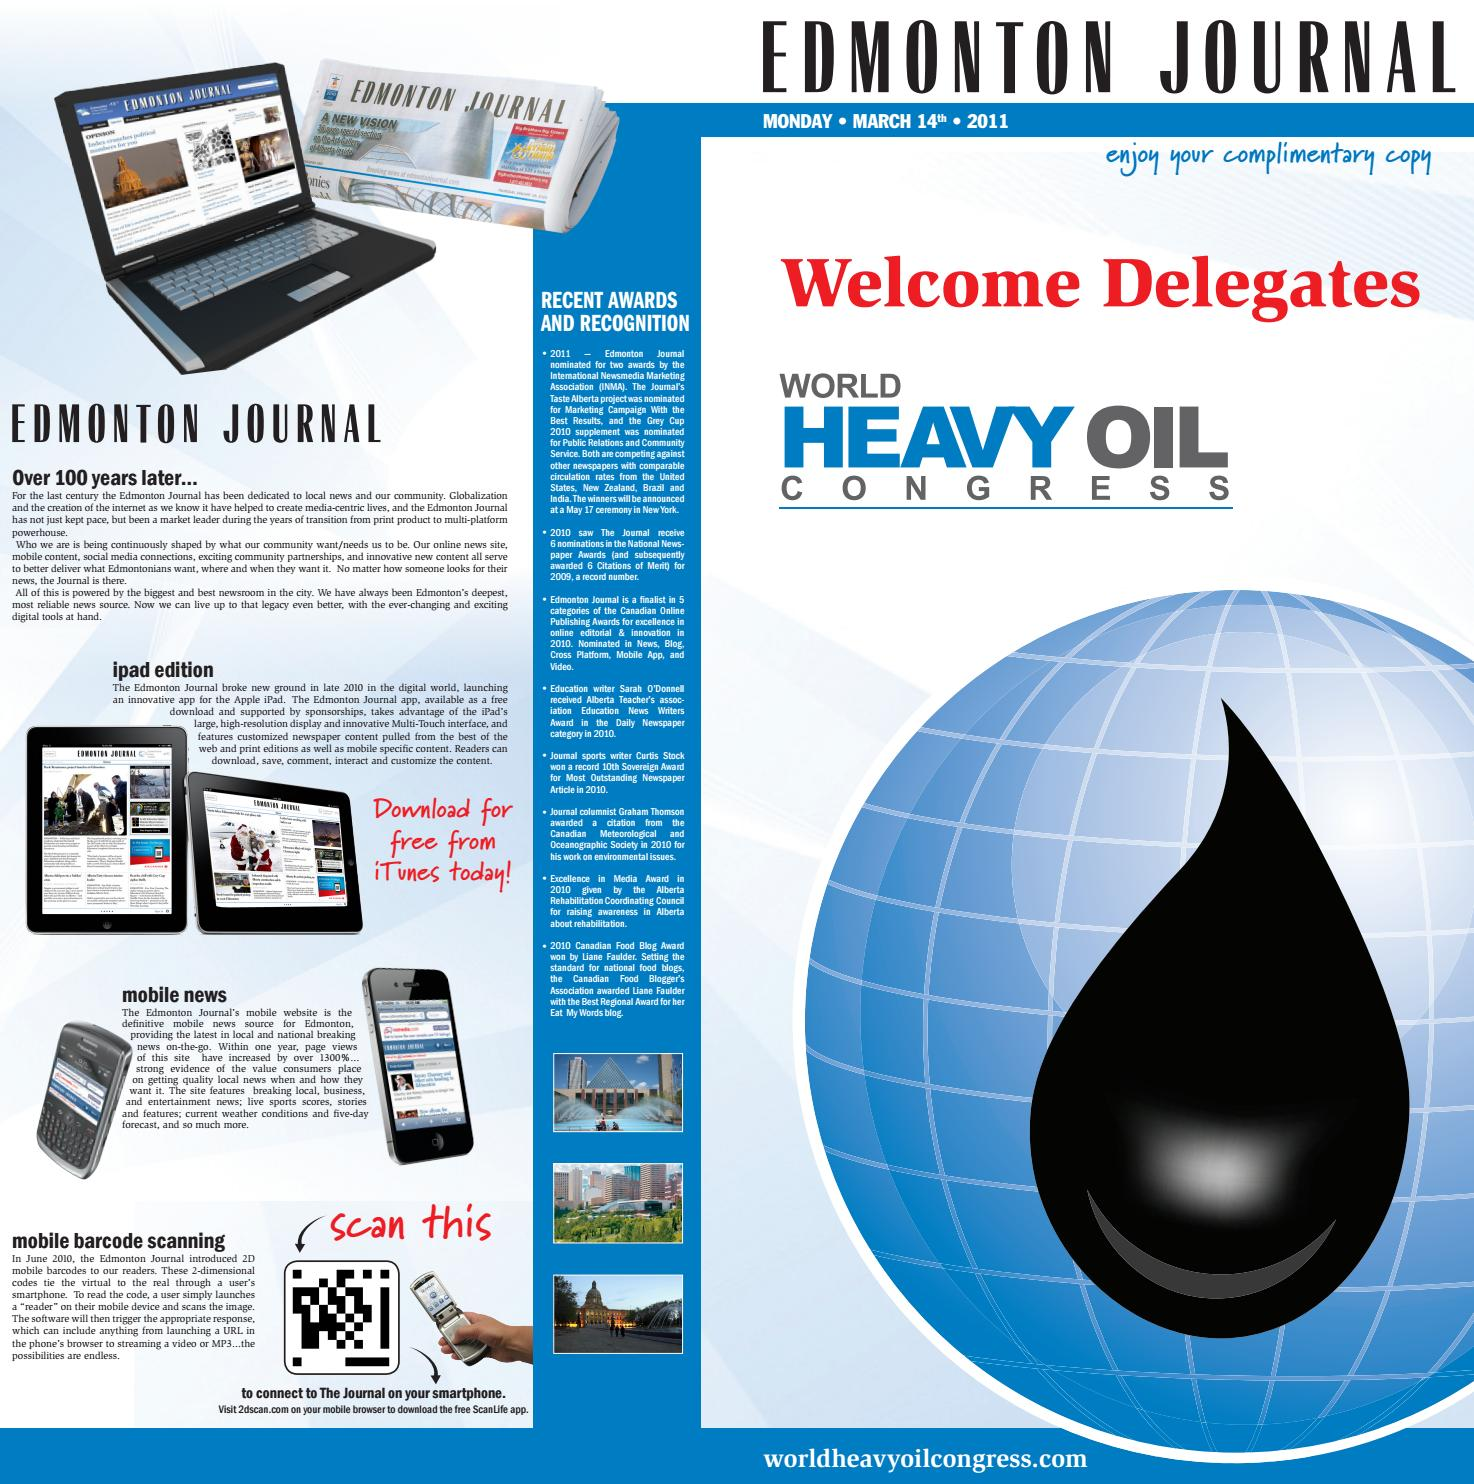 FEATURE | World Heavy Oil Congress by Kelle C | 7th Stranger